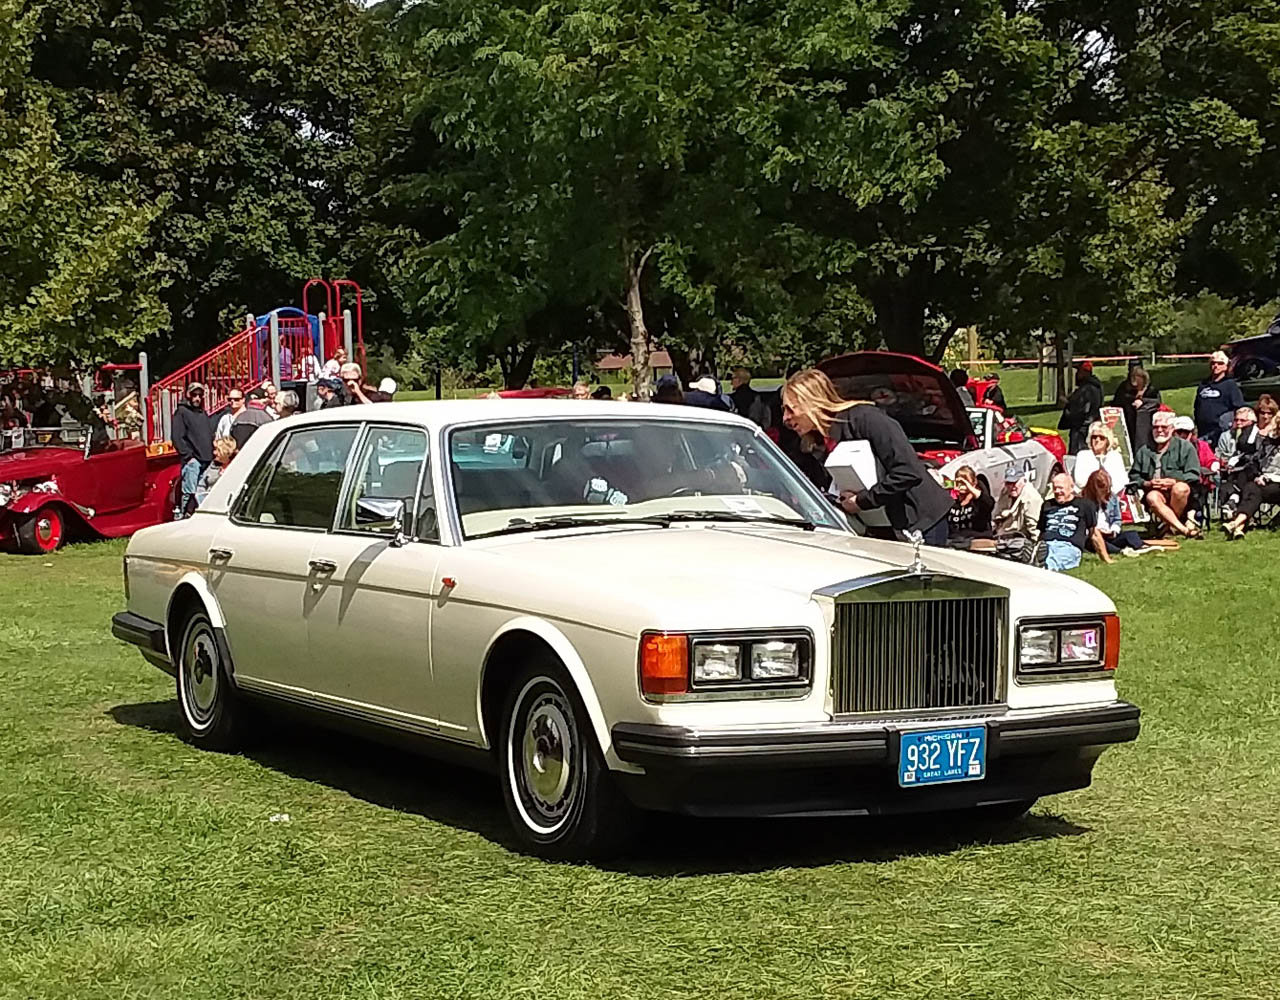 Super Sunday- 1991 Rolls Royce, Ron Rummel 1